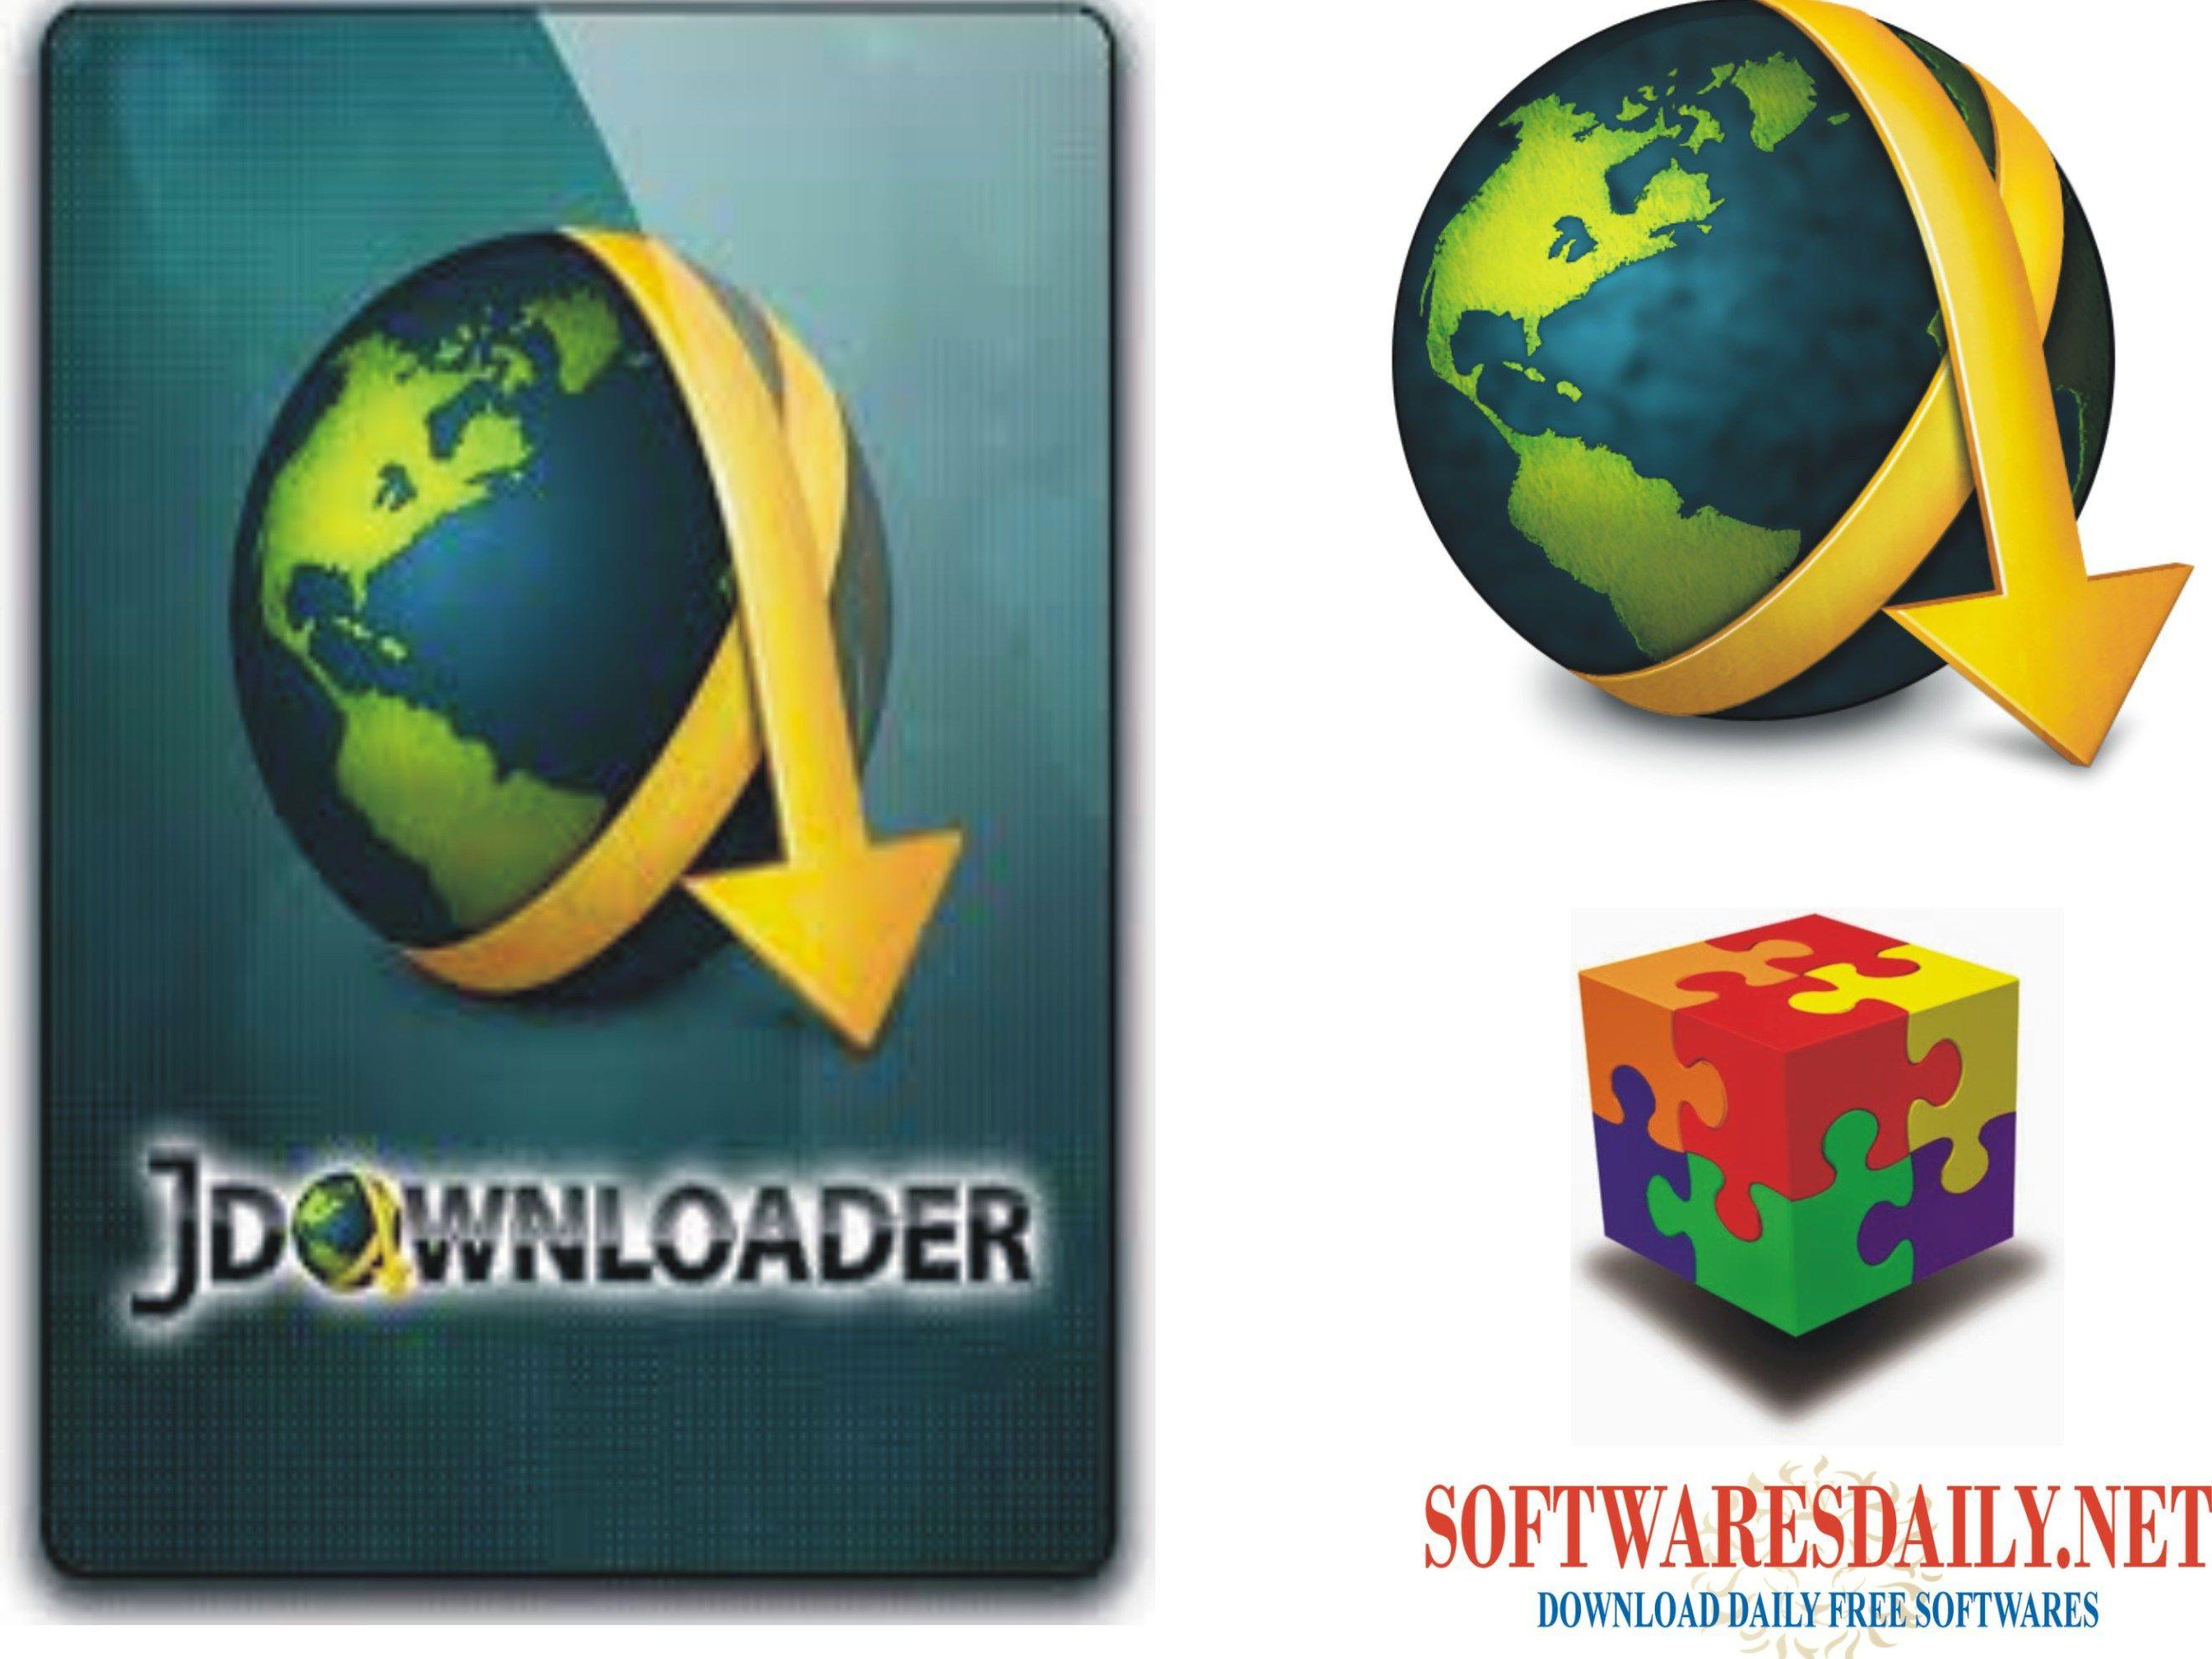 JDownloader 2017-2018 Full Free Download | SoftwaresDaily